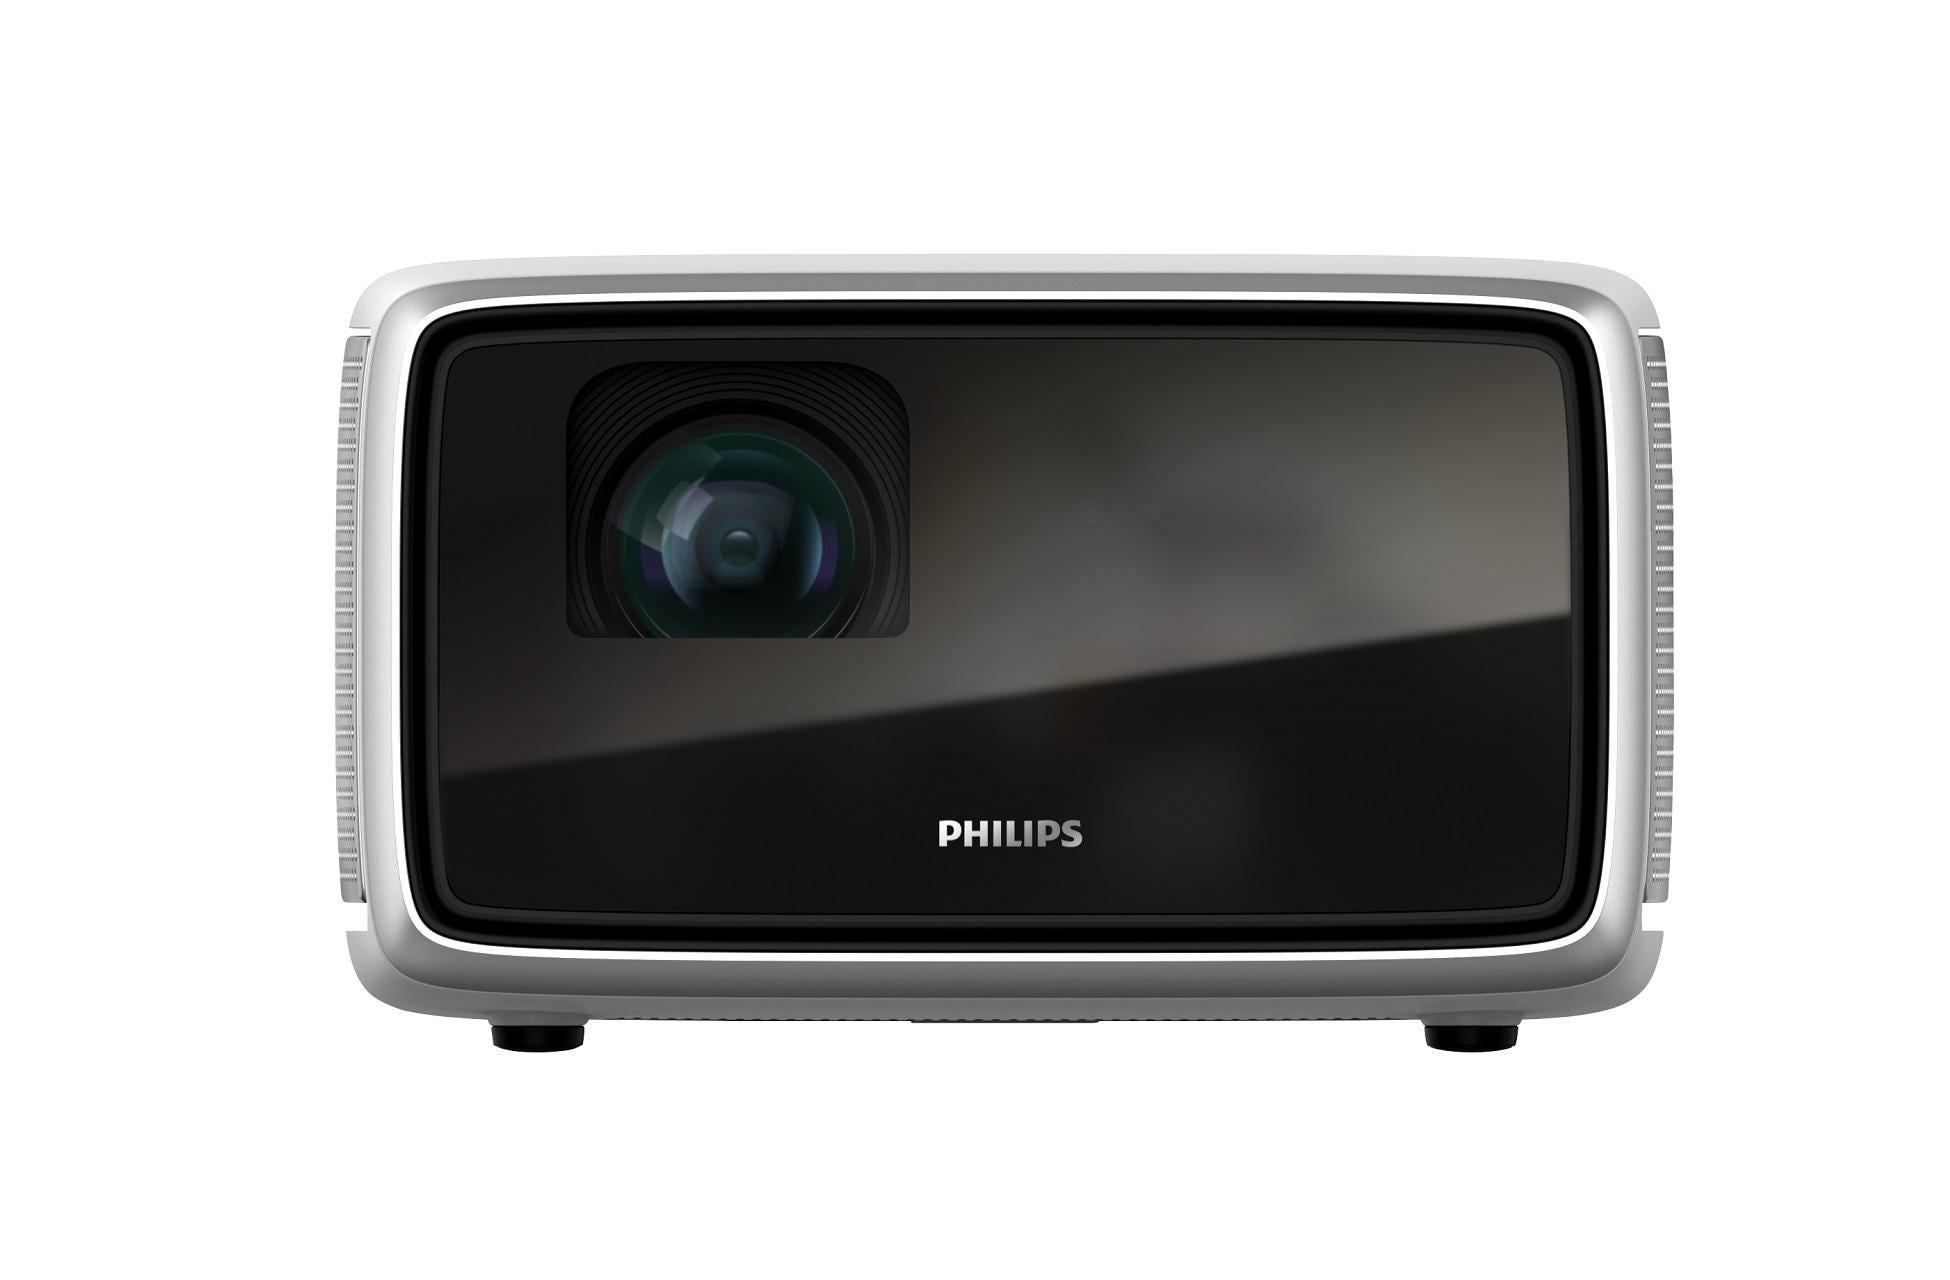 Philips Screeneo S4 Full HD projector